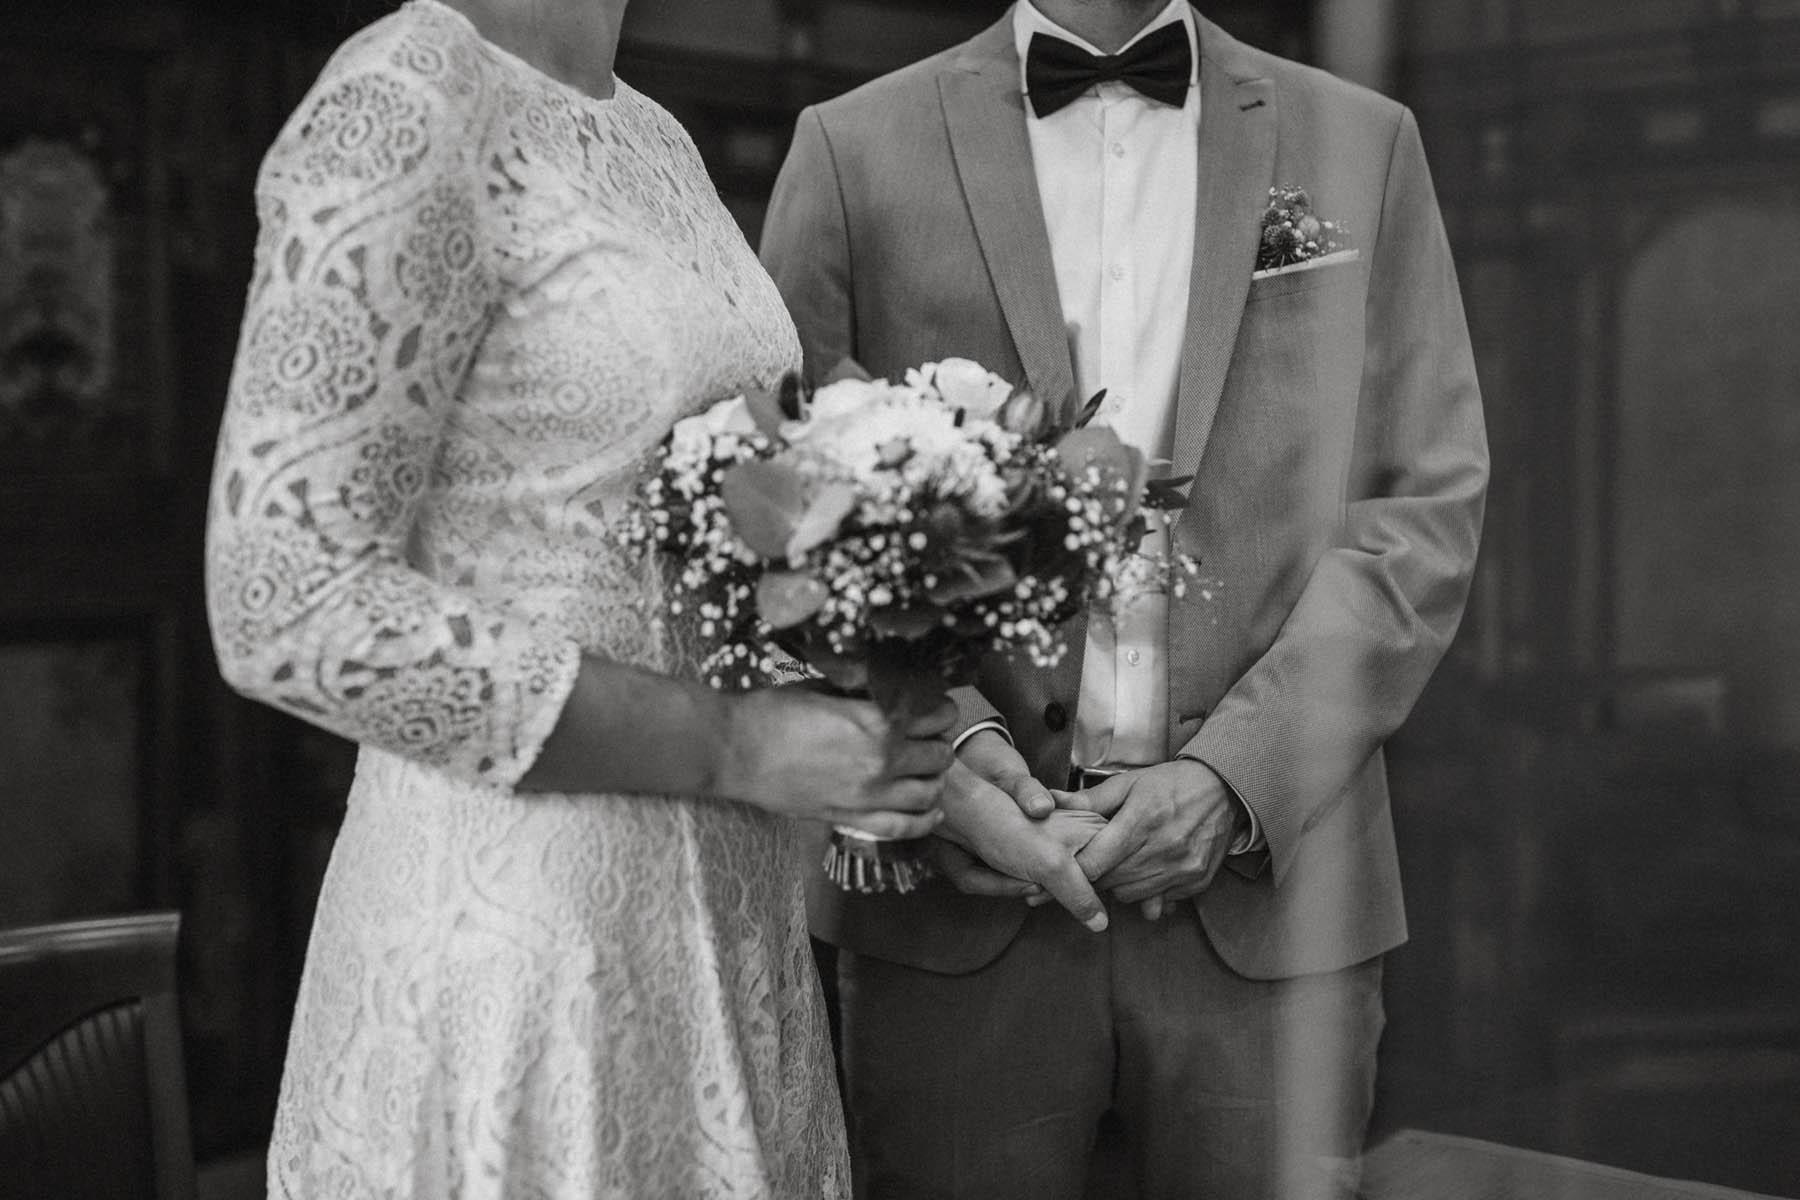 raissa simon fotografie elopement freiburg standesamt 010 - Julia + Tobias